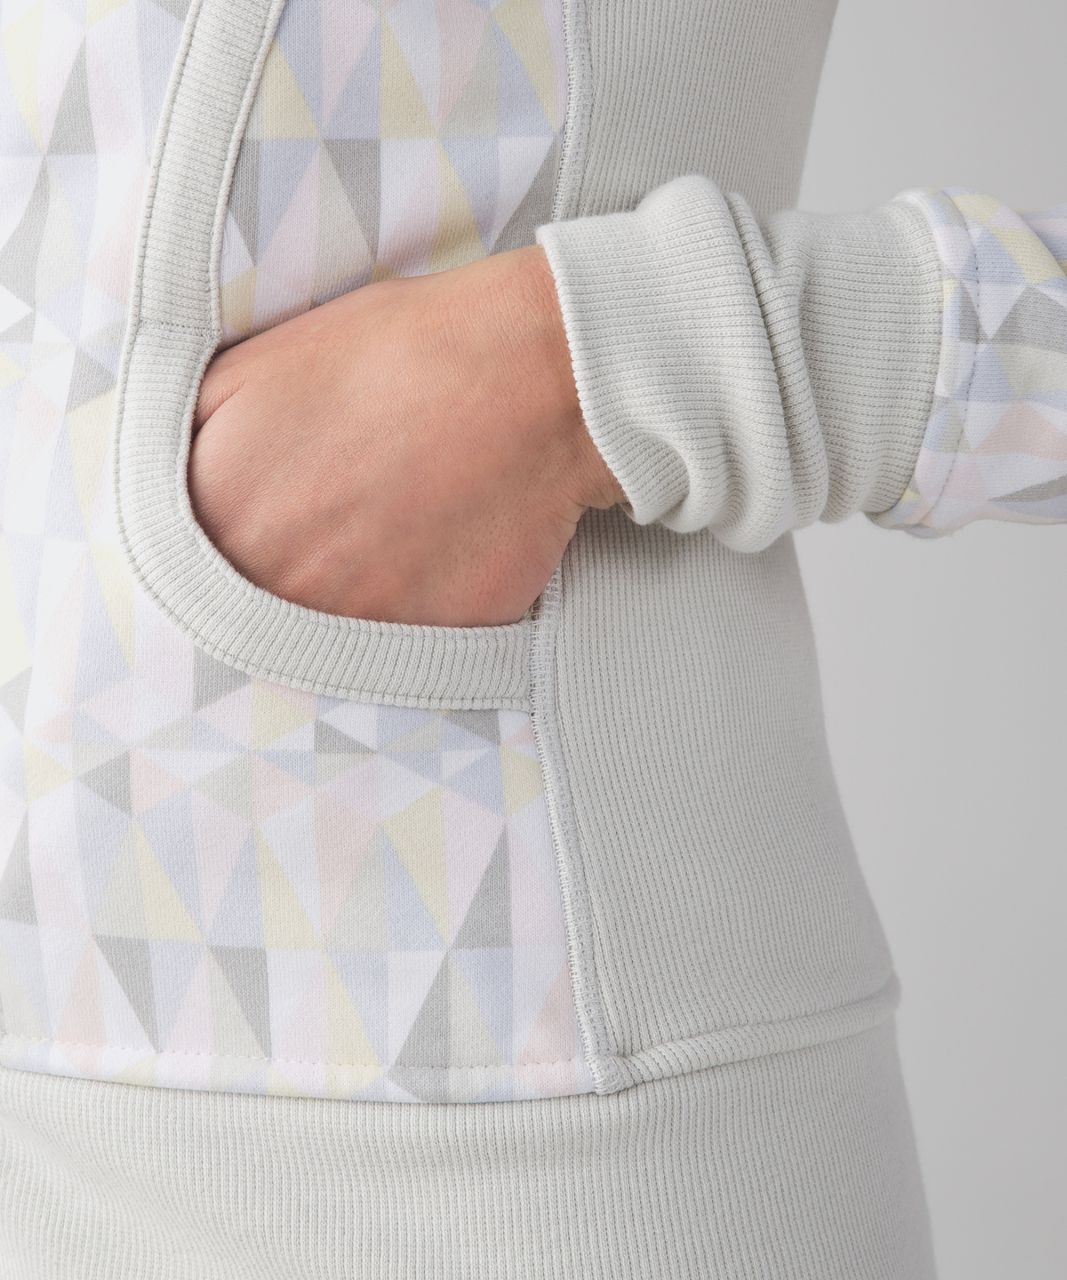 Lululemon Scuba Hoodie II - Stained Glass Love White Neutral Blush / Whisper Pink / Nimbus